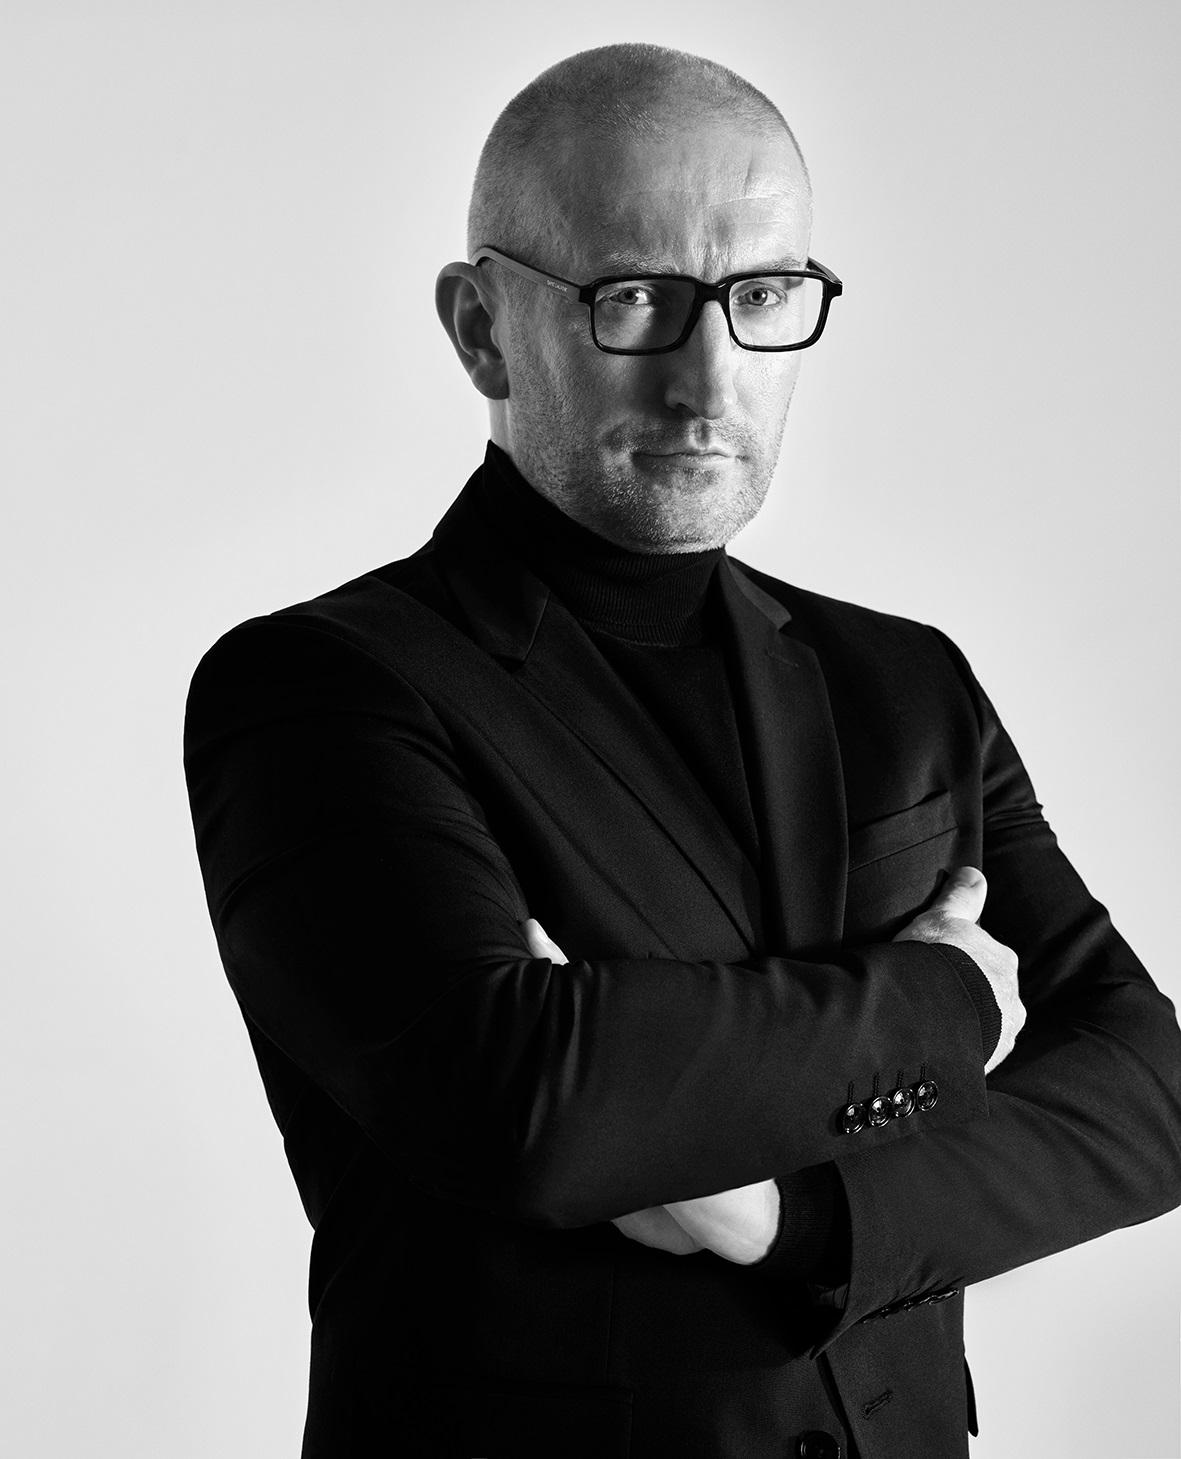 Robert Małecki fot. Zuza Krajewska Warsaw Creatives